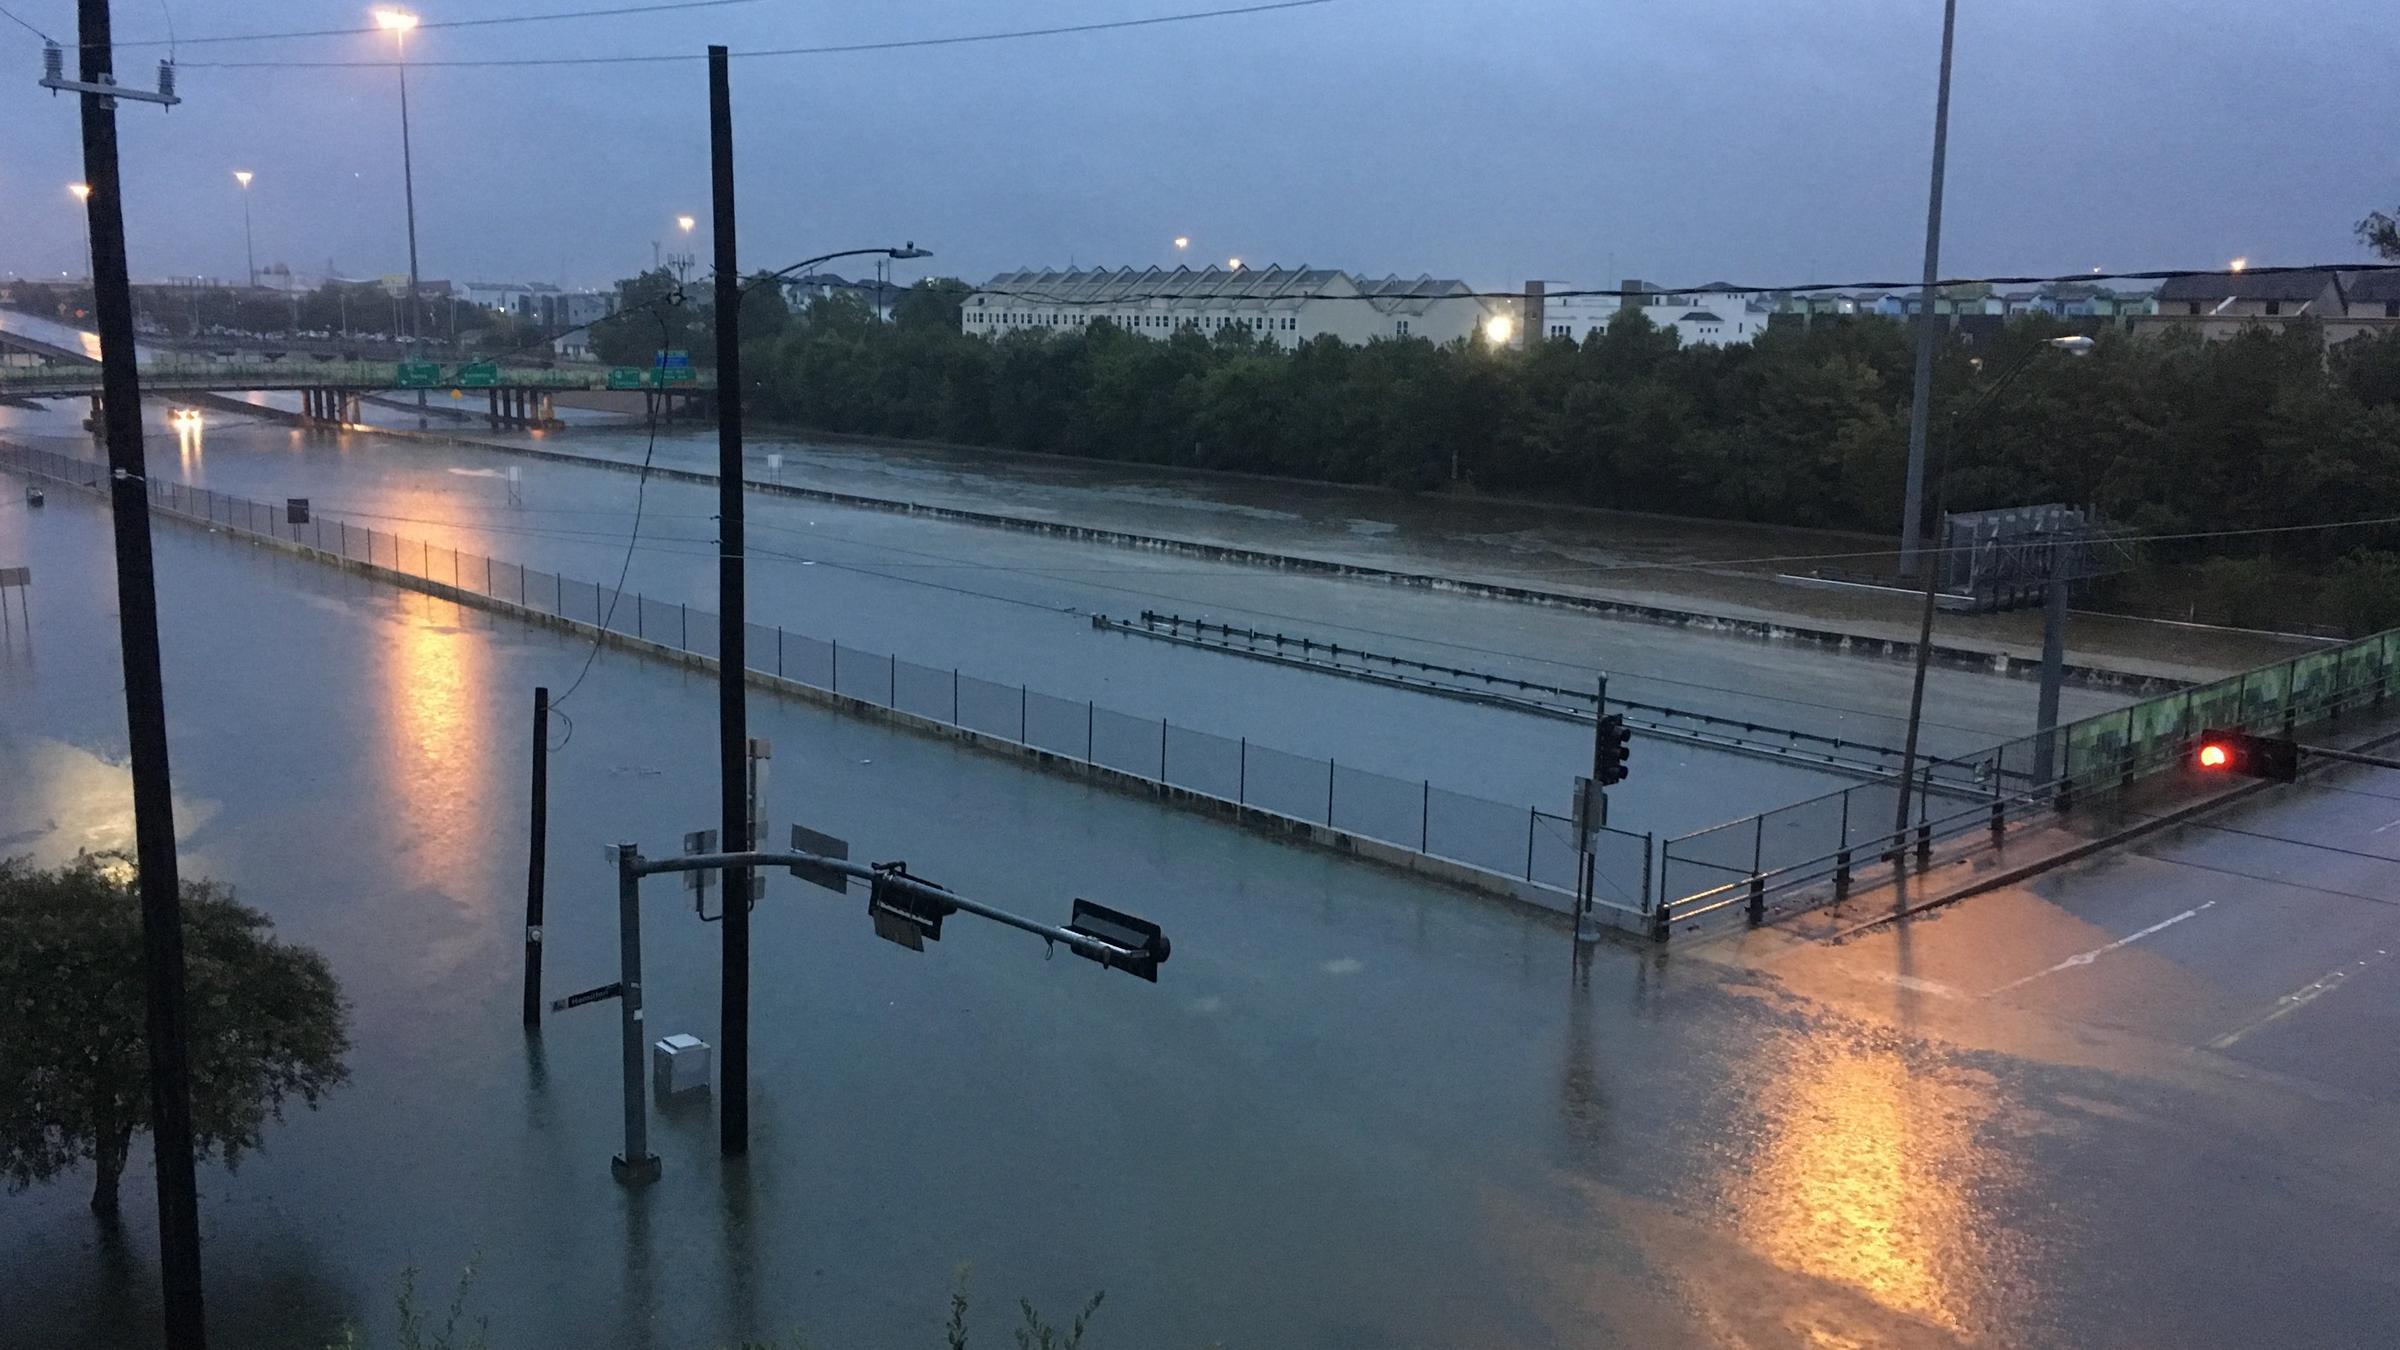 houston flooding - photo #23